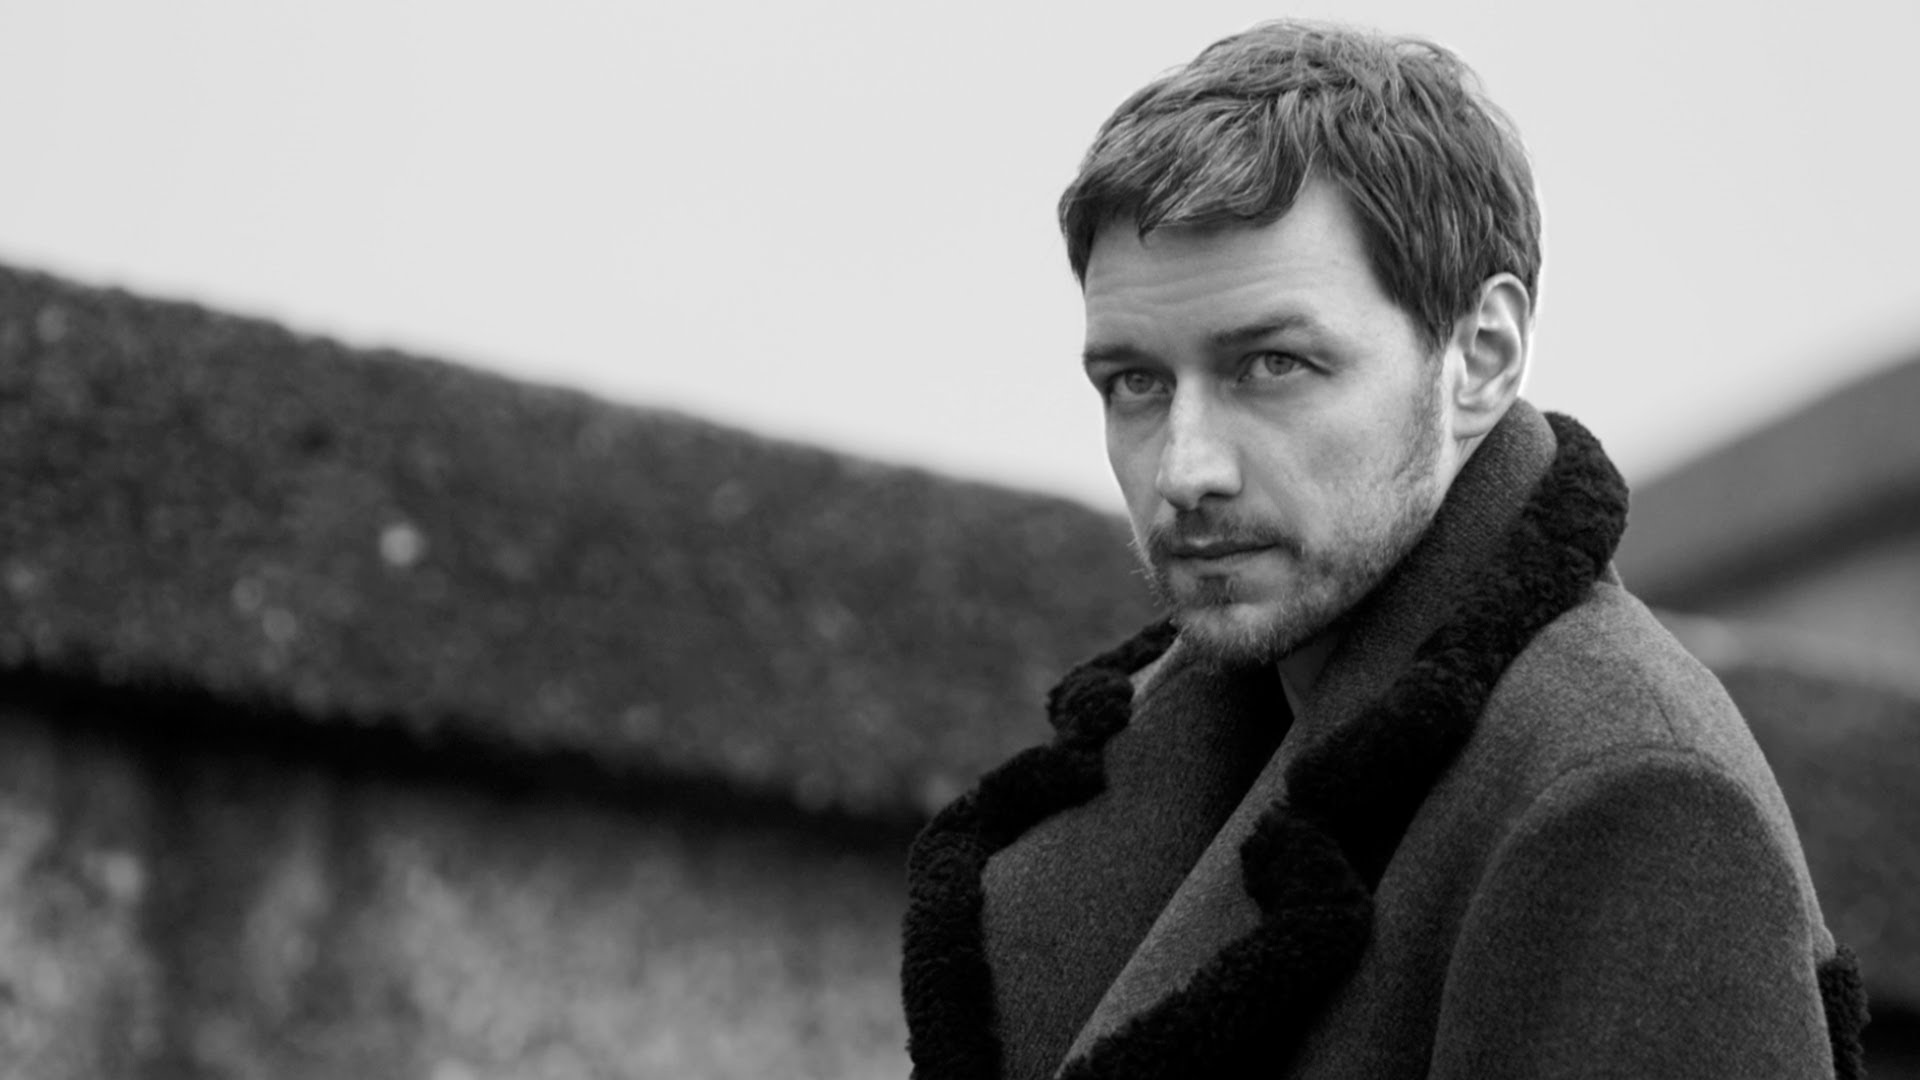 Prada Fall/Winter 2014 Men's Advertising Campaign: Behind The Scenes